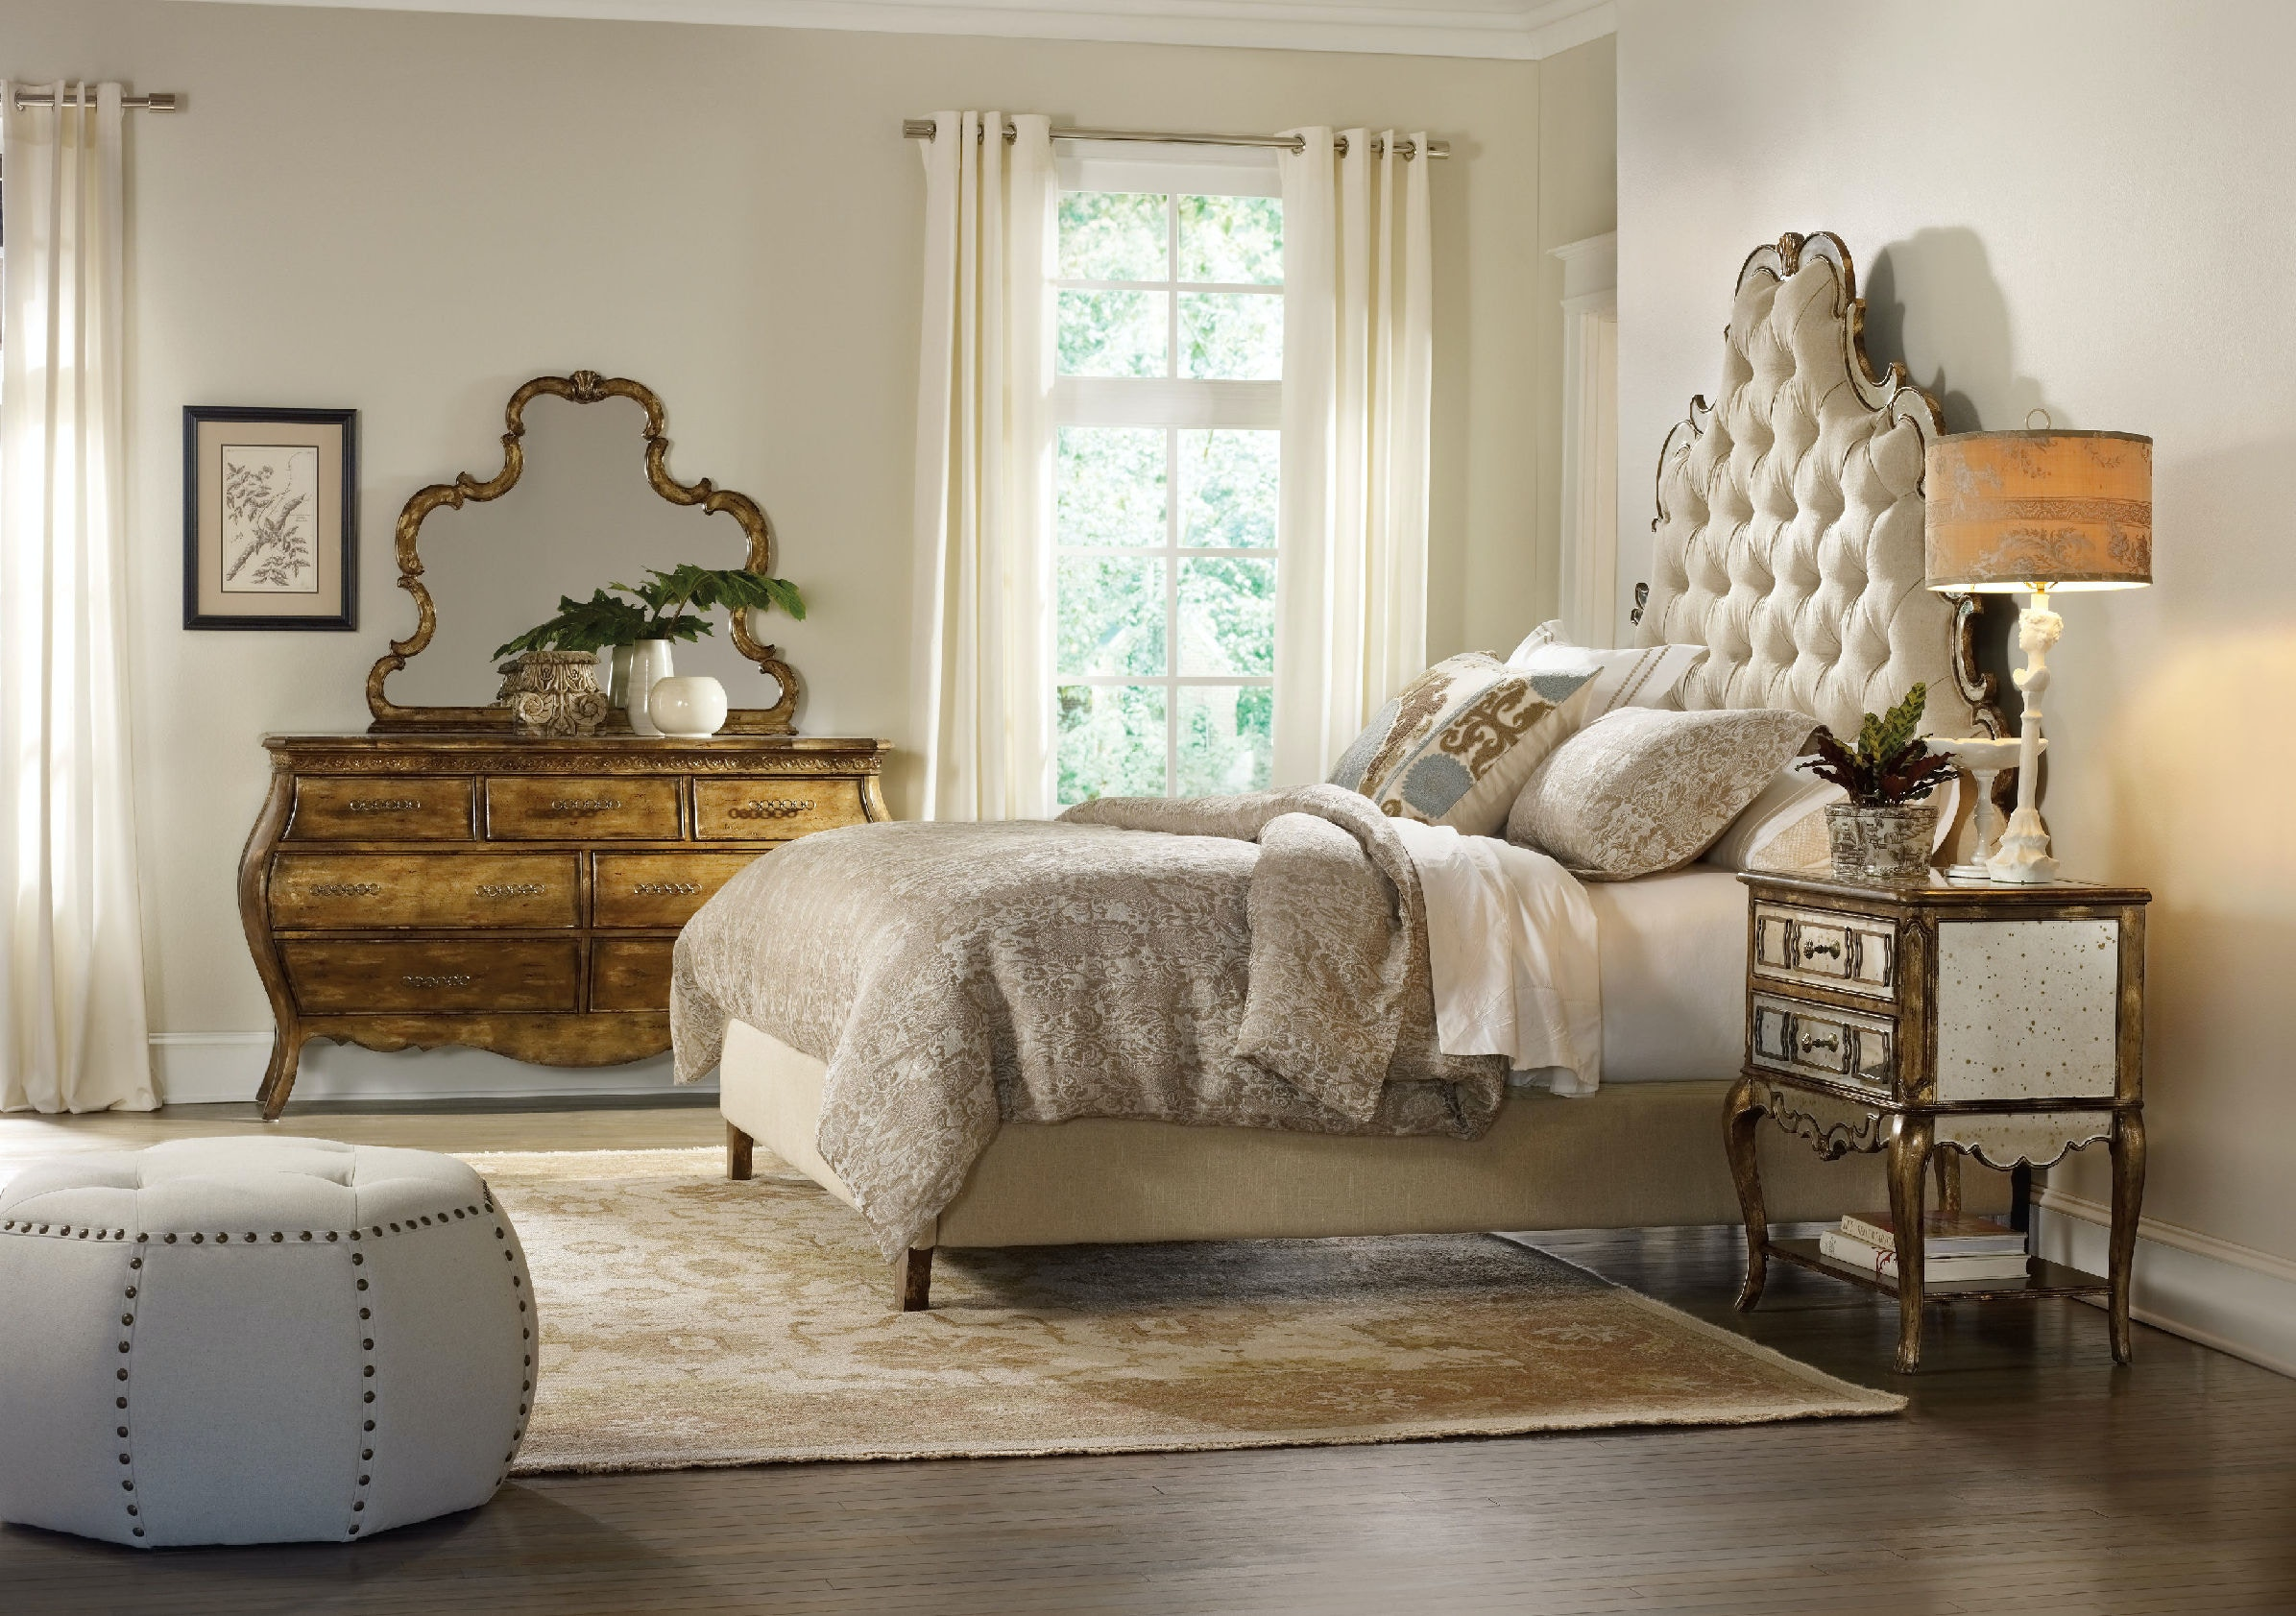 hooker furniture sanctuary king tufted bed bling 3016 90865